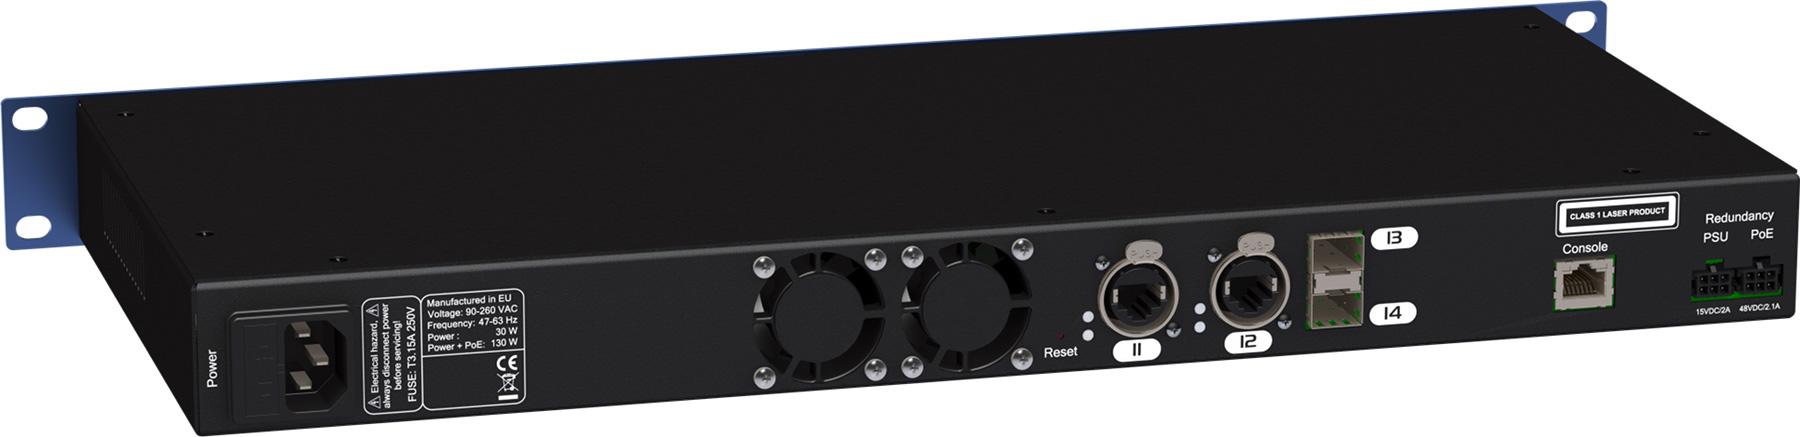 Luminex gigacore 14rpoe rackmount touring 12 port ethercon 2 sfp port poe gigabit ethernet switch - 12 port gigabit poe switch ...